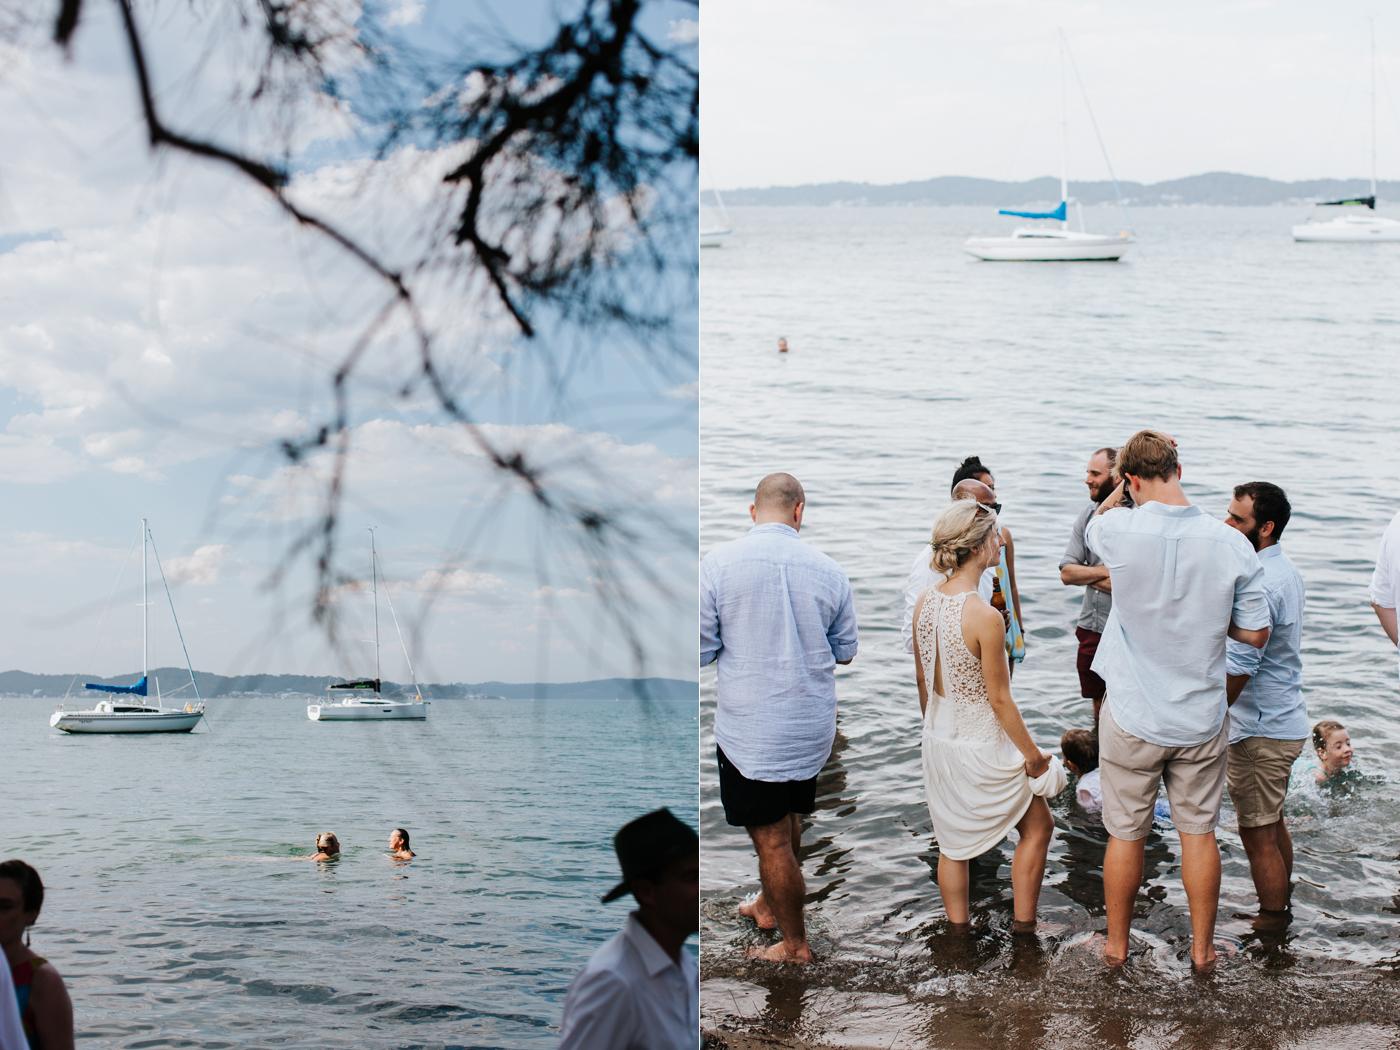 Emma & Ben - Lake Macquarie - Hunter Valley Wedding - Samantha Heather Photography-156.jpg